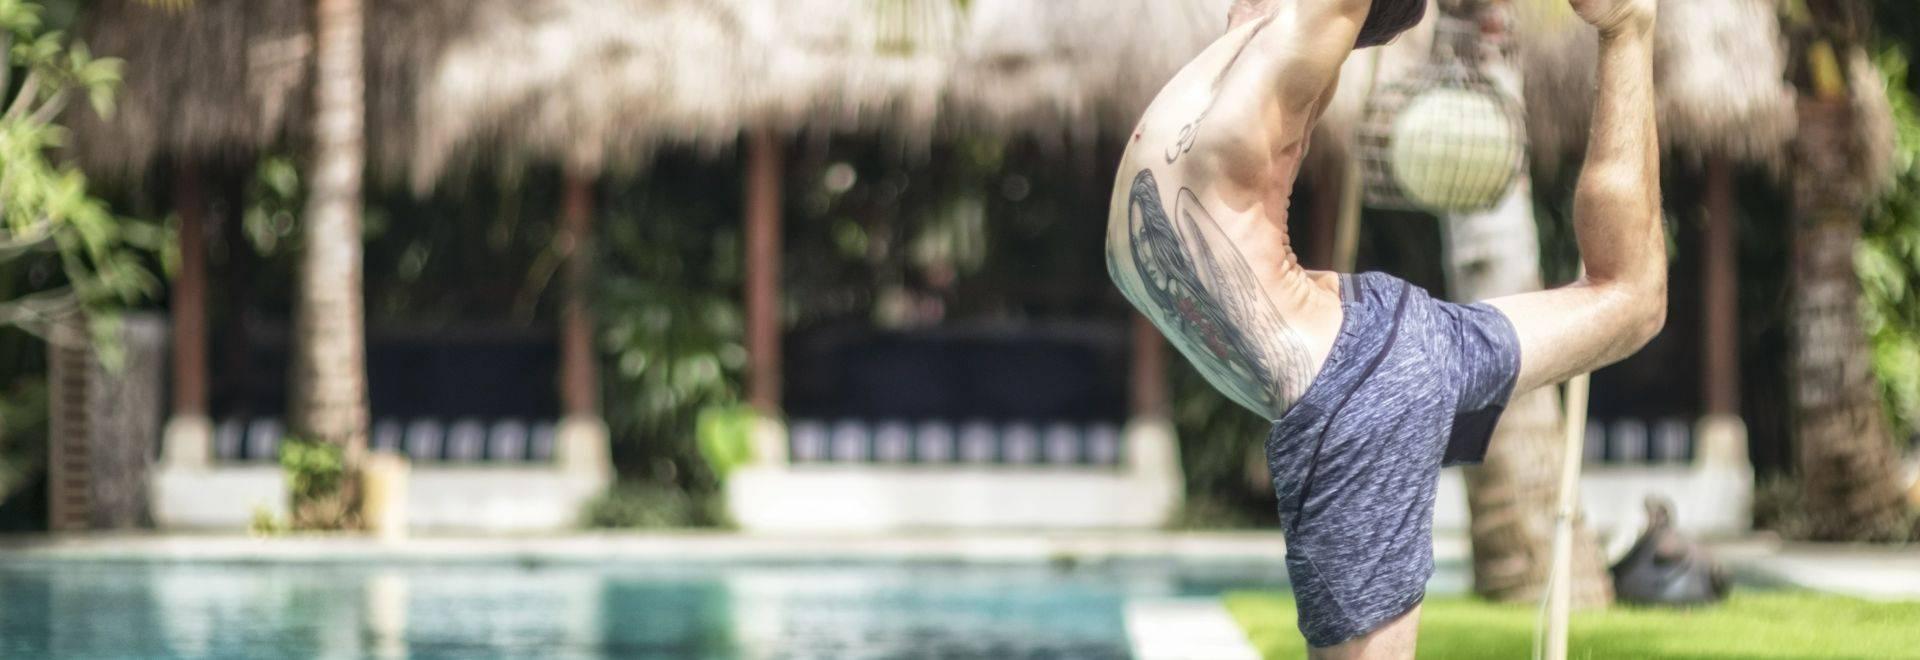 Komune-Bali-yoga-pose.jpg